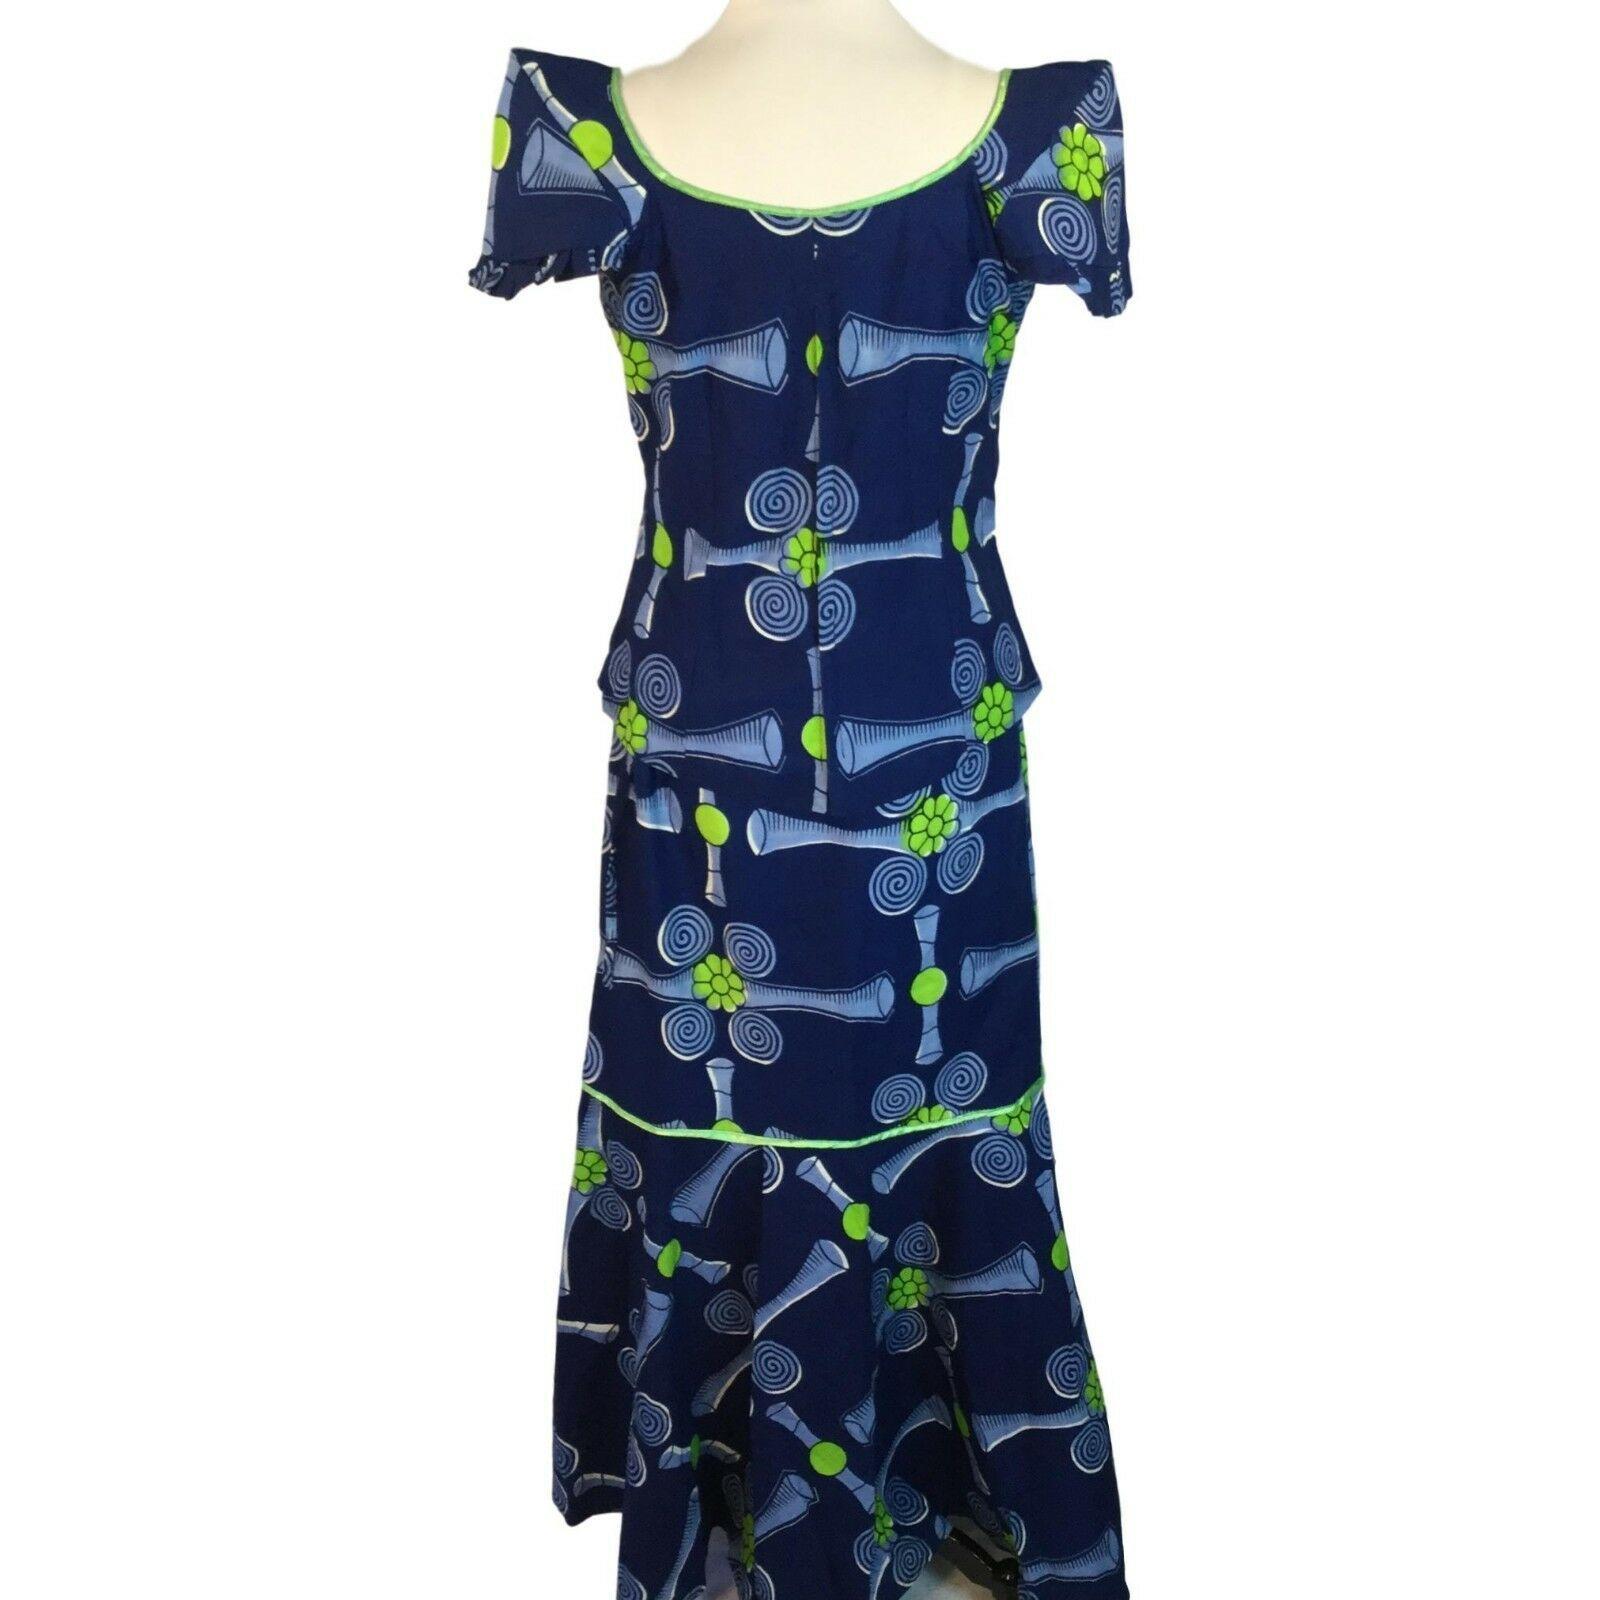 Traditional African Mermaid Drawstring Waist Skirt Top Boho Vibrant Print M / L